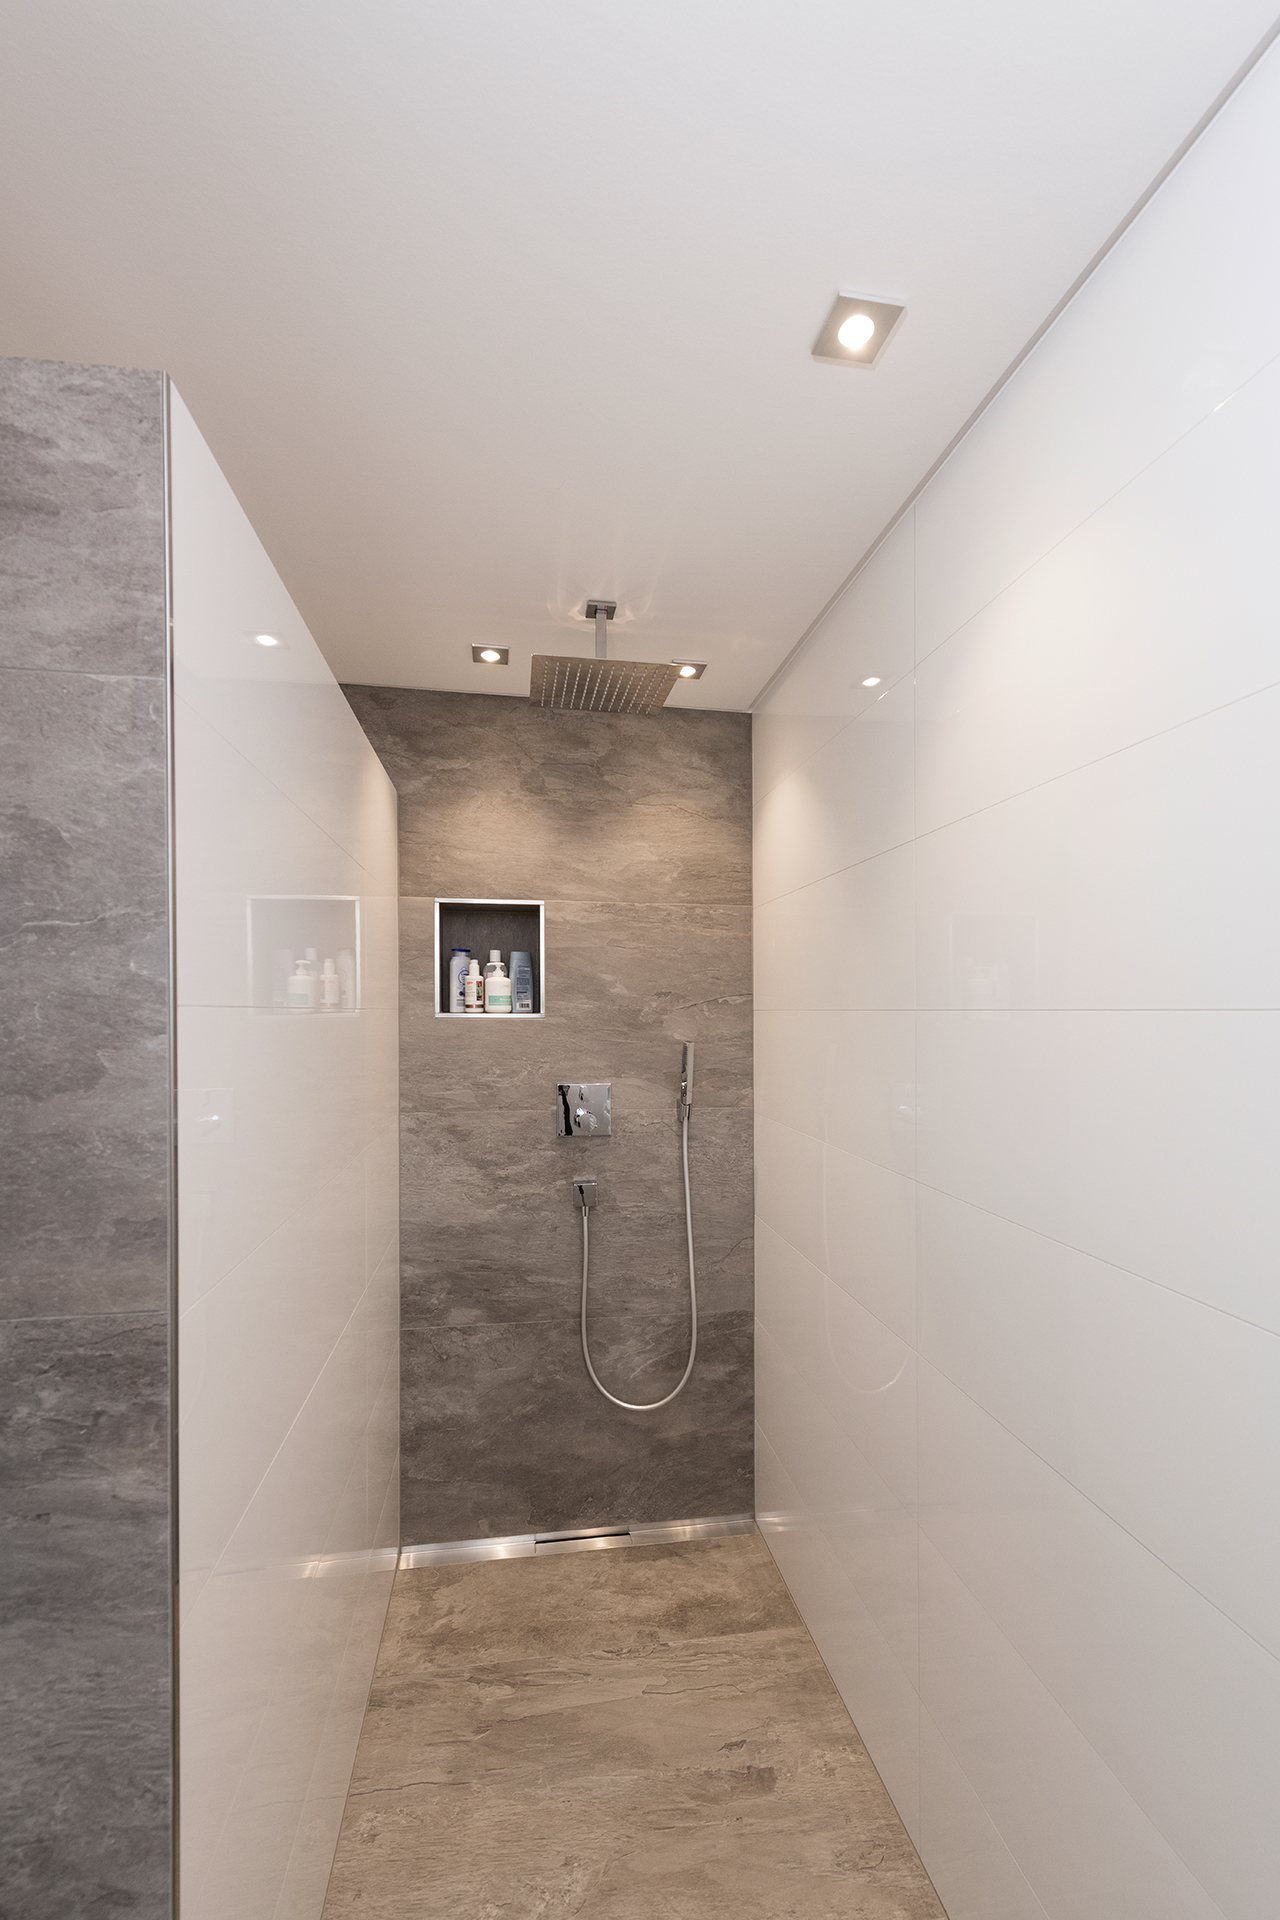 HUCK-Haustechnik-Bad-Sanitär-Installation-Modern-Dusche-Fließen